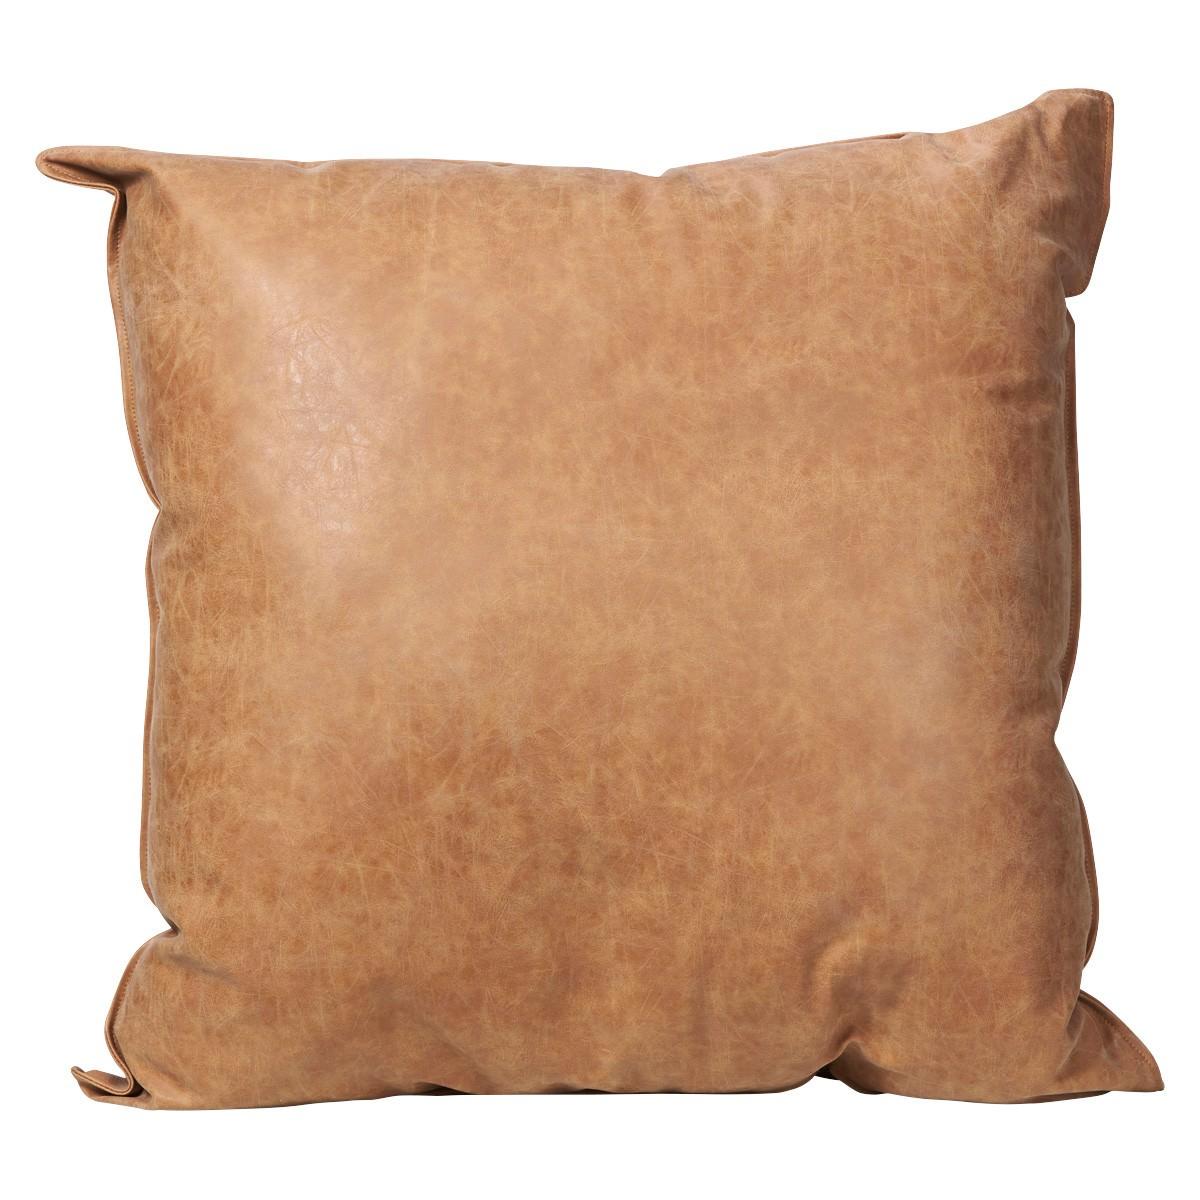 Rover PU Leather Floor Cushion, 75cm, Tan